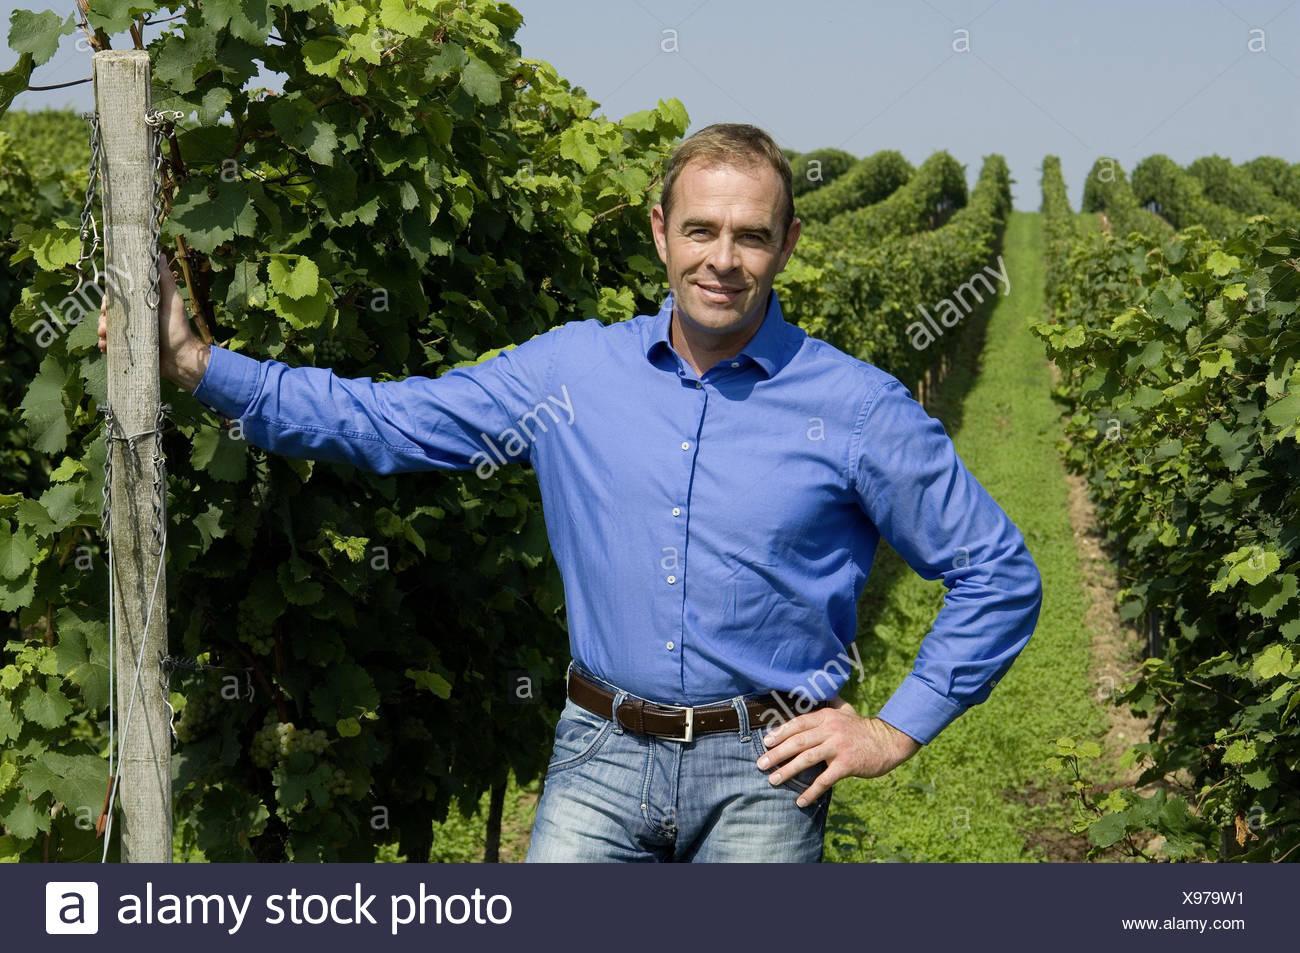 Vineyard, winegrower, satisfaction, person, man, viticulturist, vines, vines, grapes, wine, wine-growing, Önologie, vineyard, the Palatinate, vines, work, occupation, stand, pride, work, occupation, - Stock Image